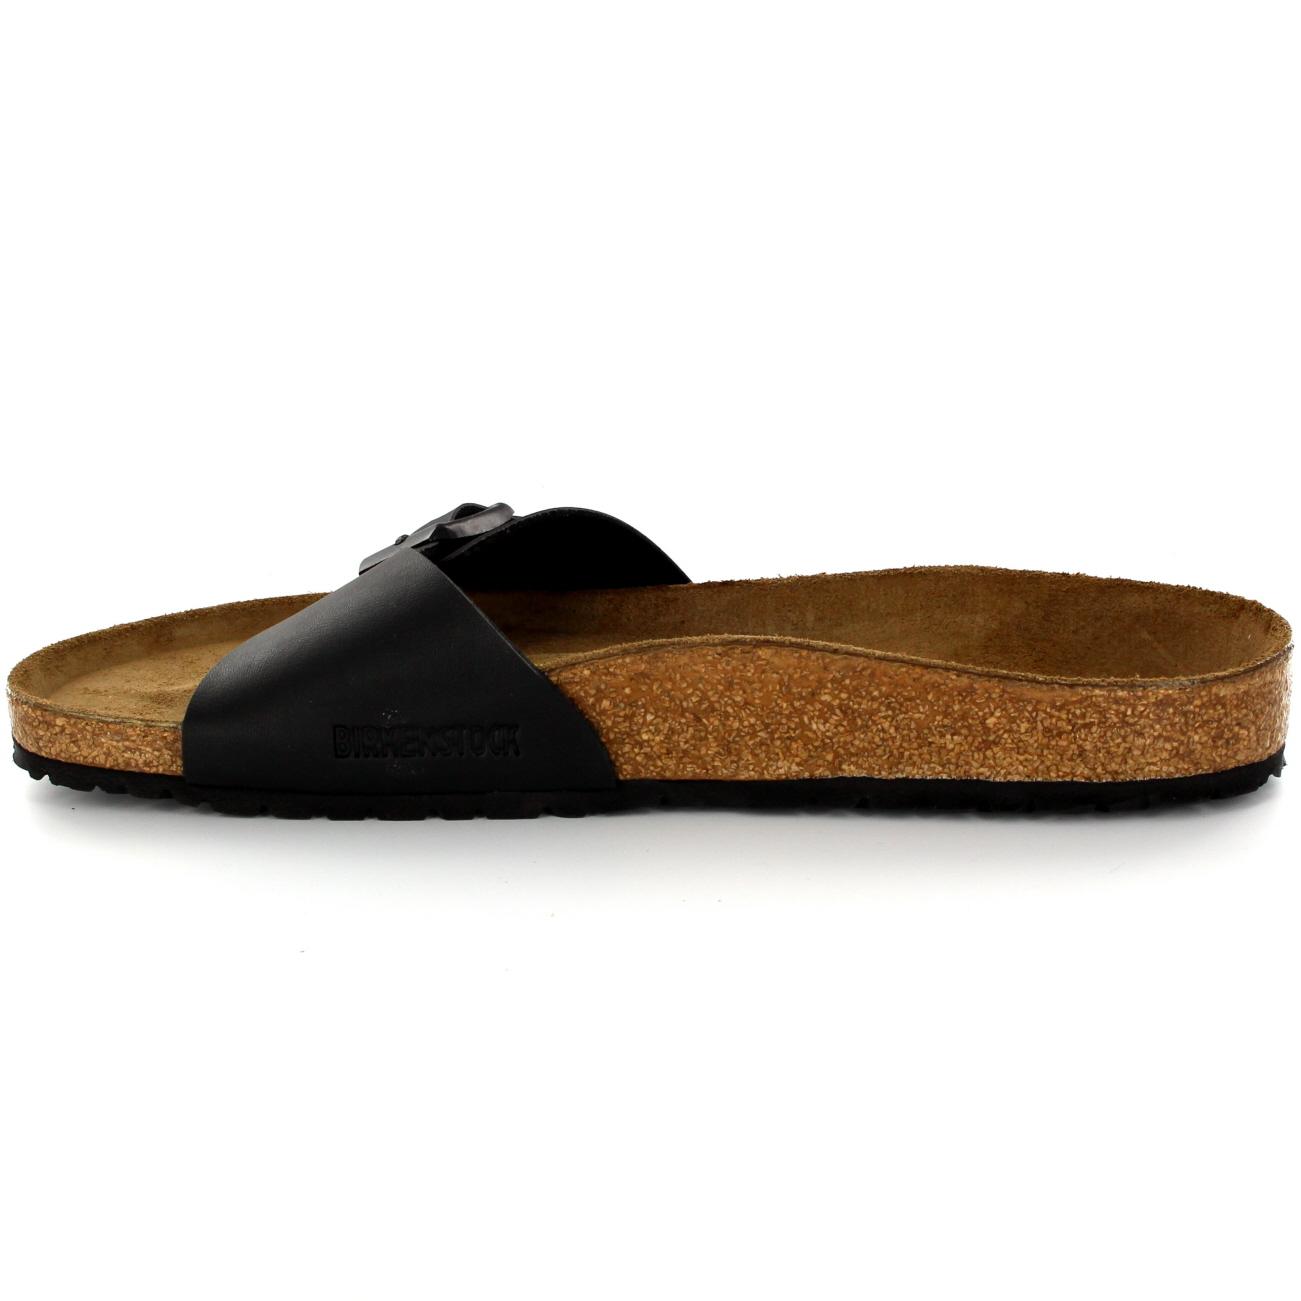 Unisex-Adults-Birkenstock-Madrid-Casual-Birko-Flor-Beach-Summer-Sandals-UK-2-13 thumbnail 11